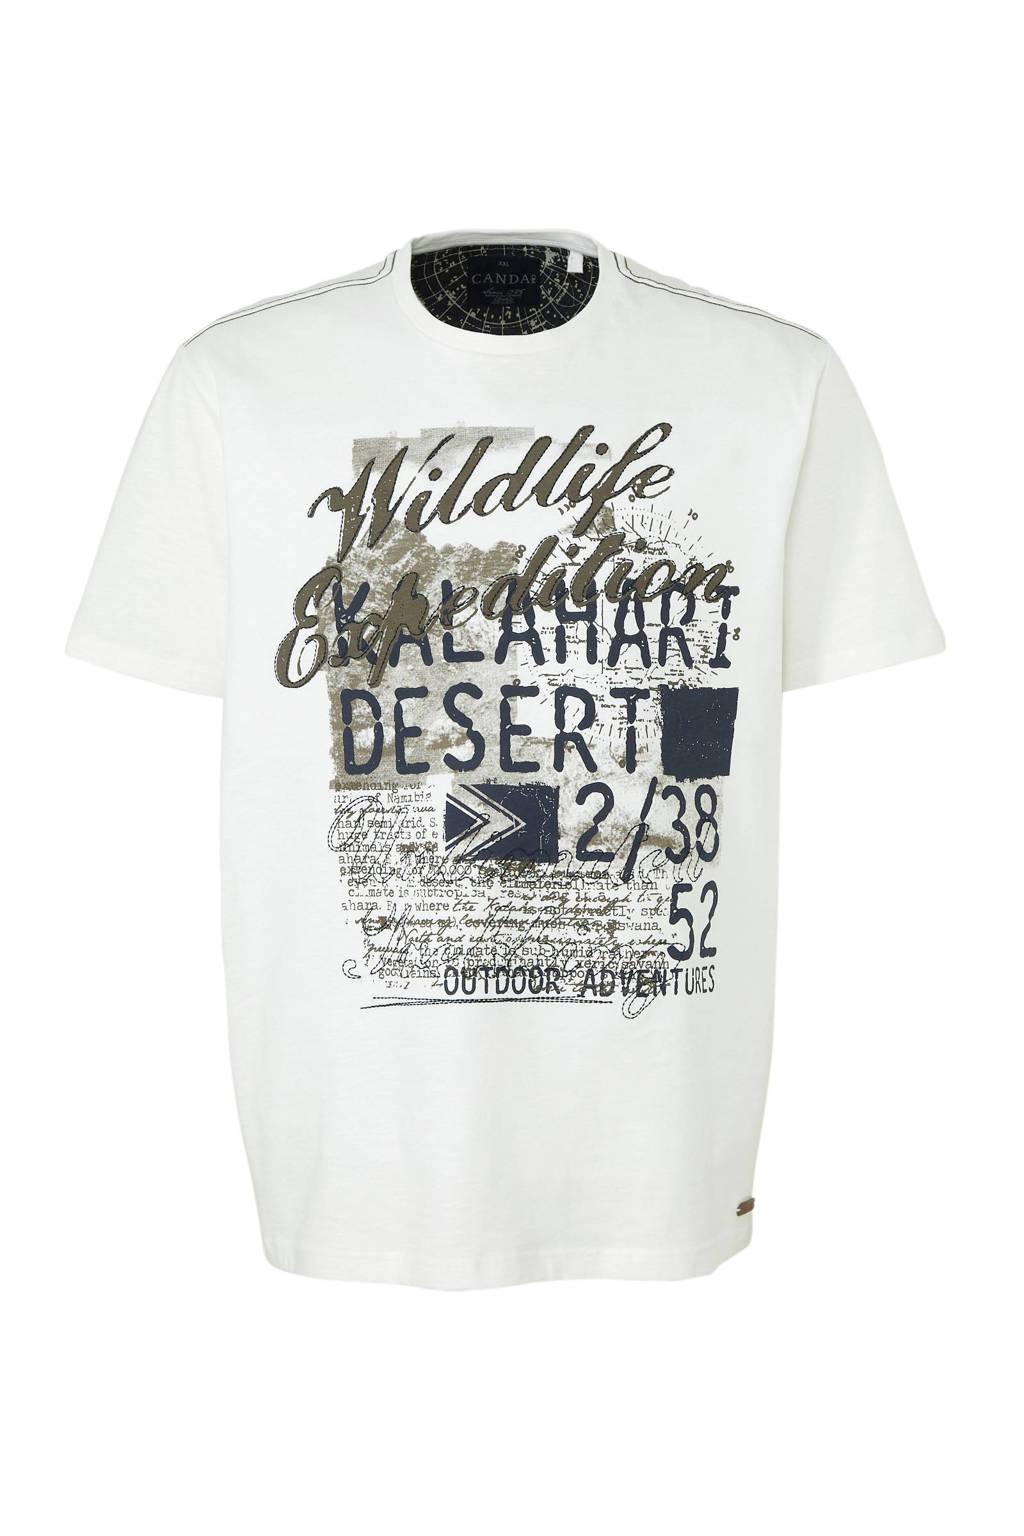 C&A XL Canda T-shirt met printopdruk wit, Wit